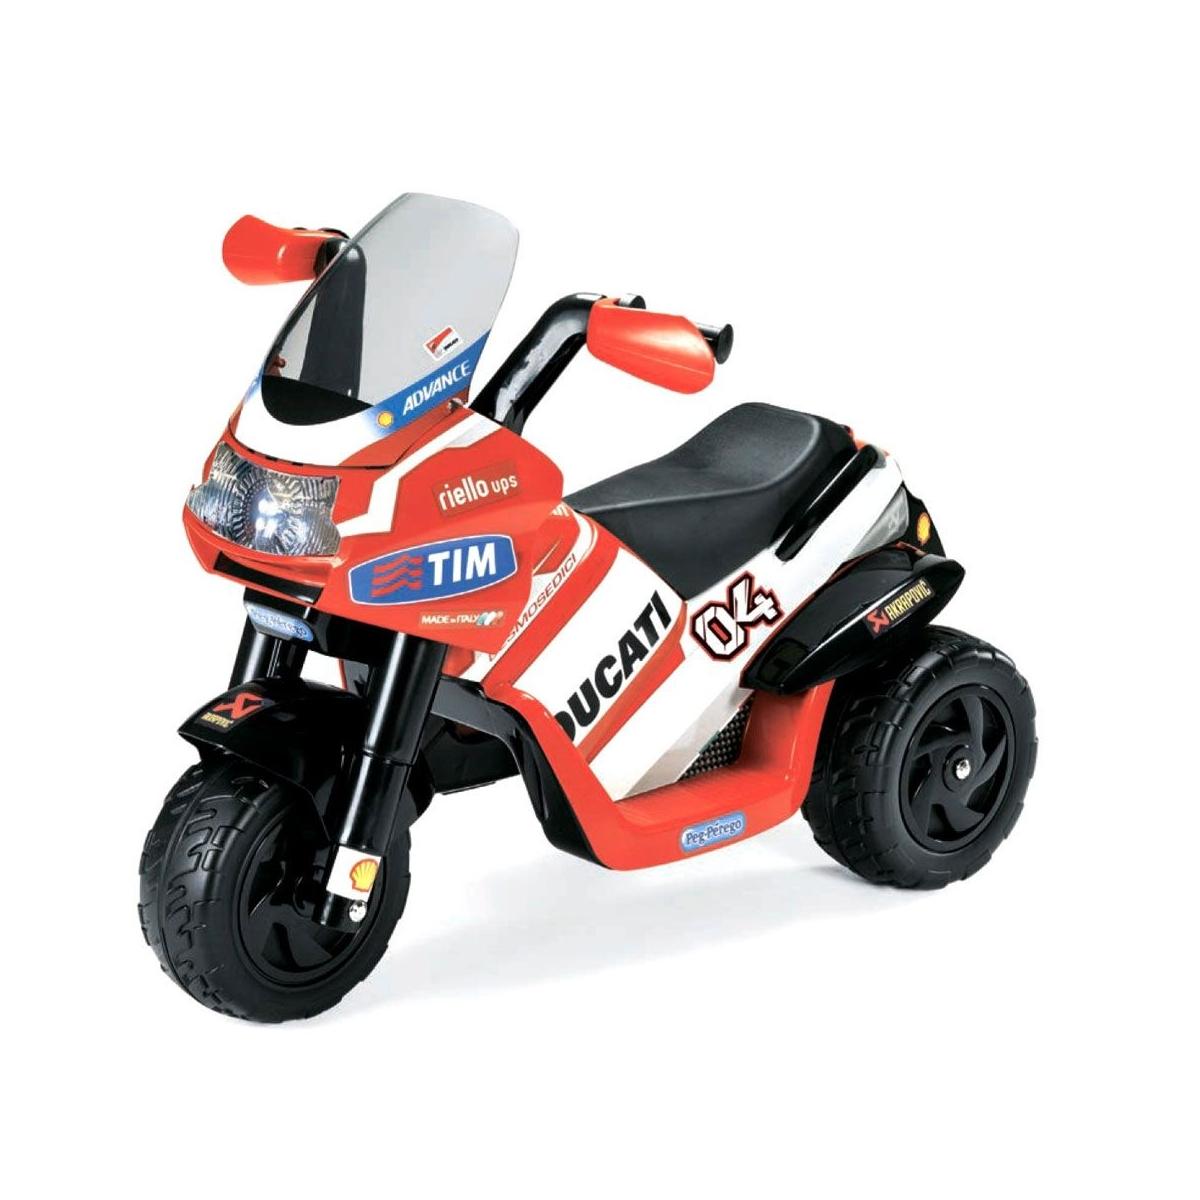 Peg Perego Desmosedici Evo Motorbike (NEW)